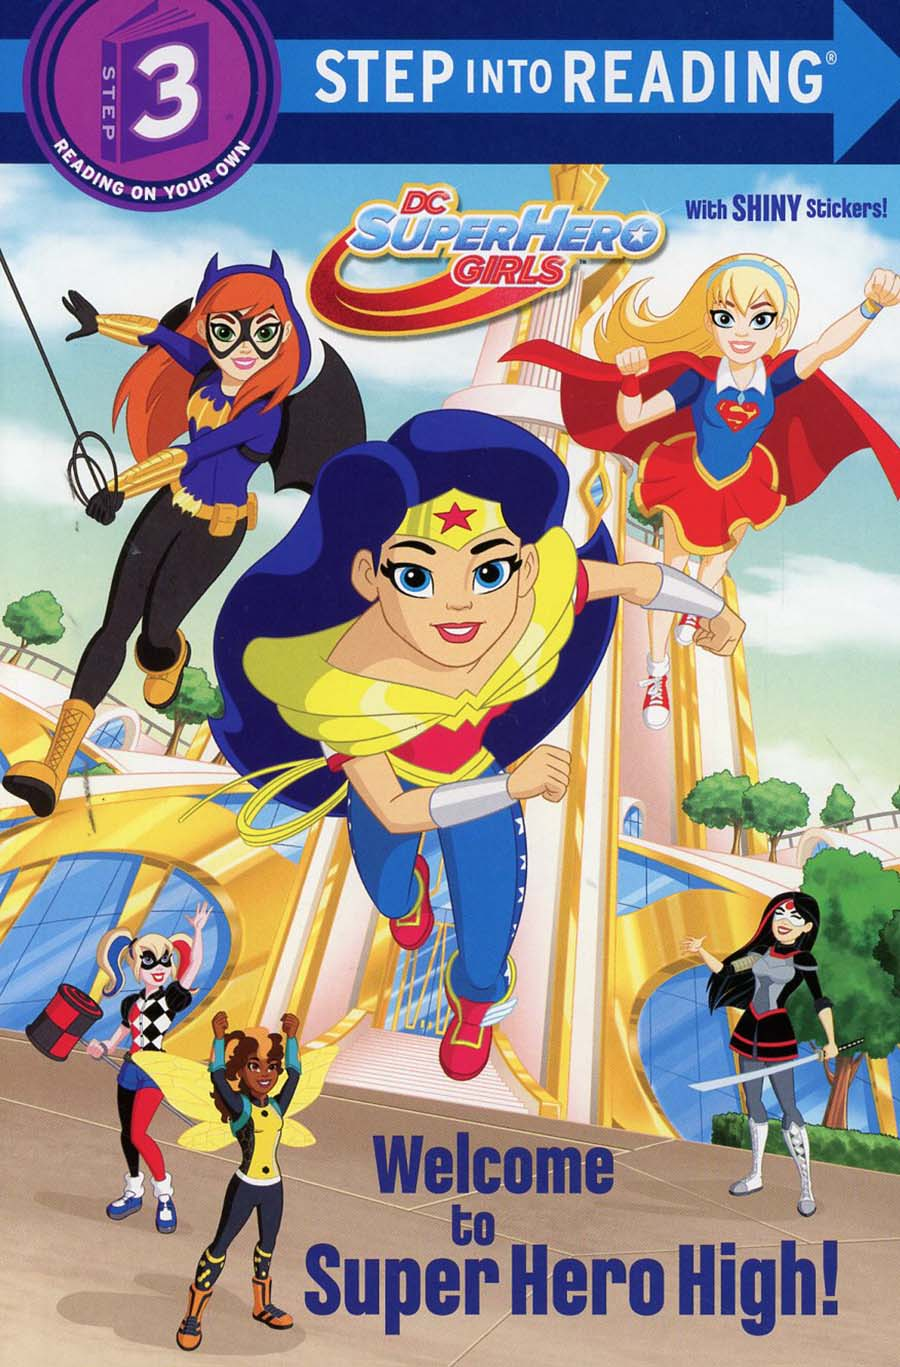 DC Super Hero Girls Welcome To Super Hero High SC